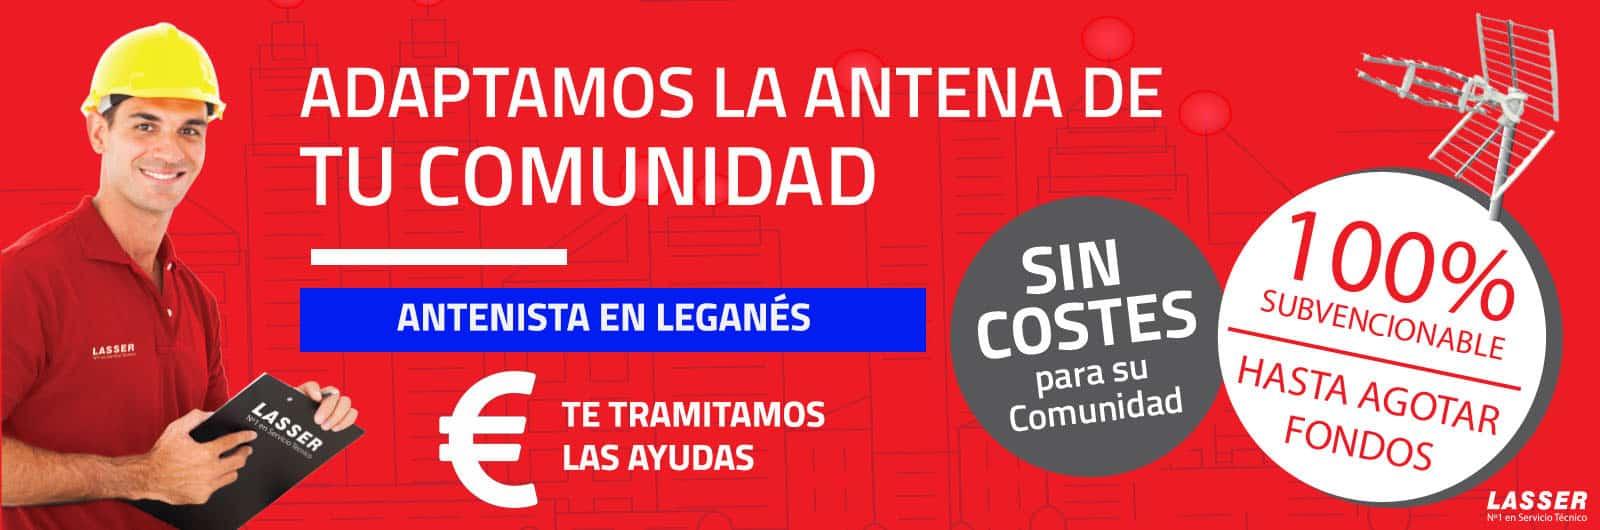 segundo-dividendo-digital-antena-comunidades-promocion-leganes